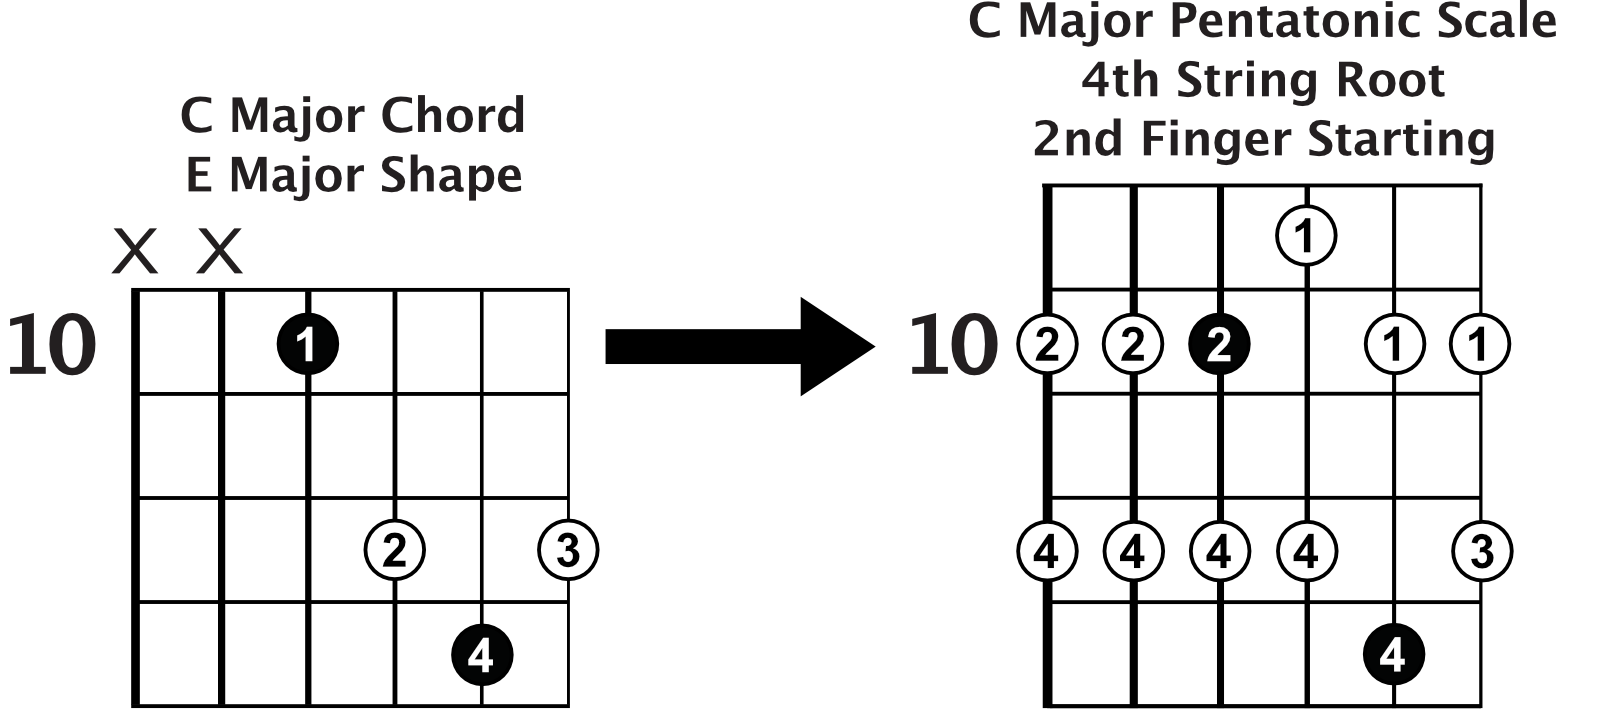 C major pentatonic navigation sliding